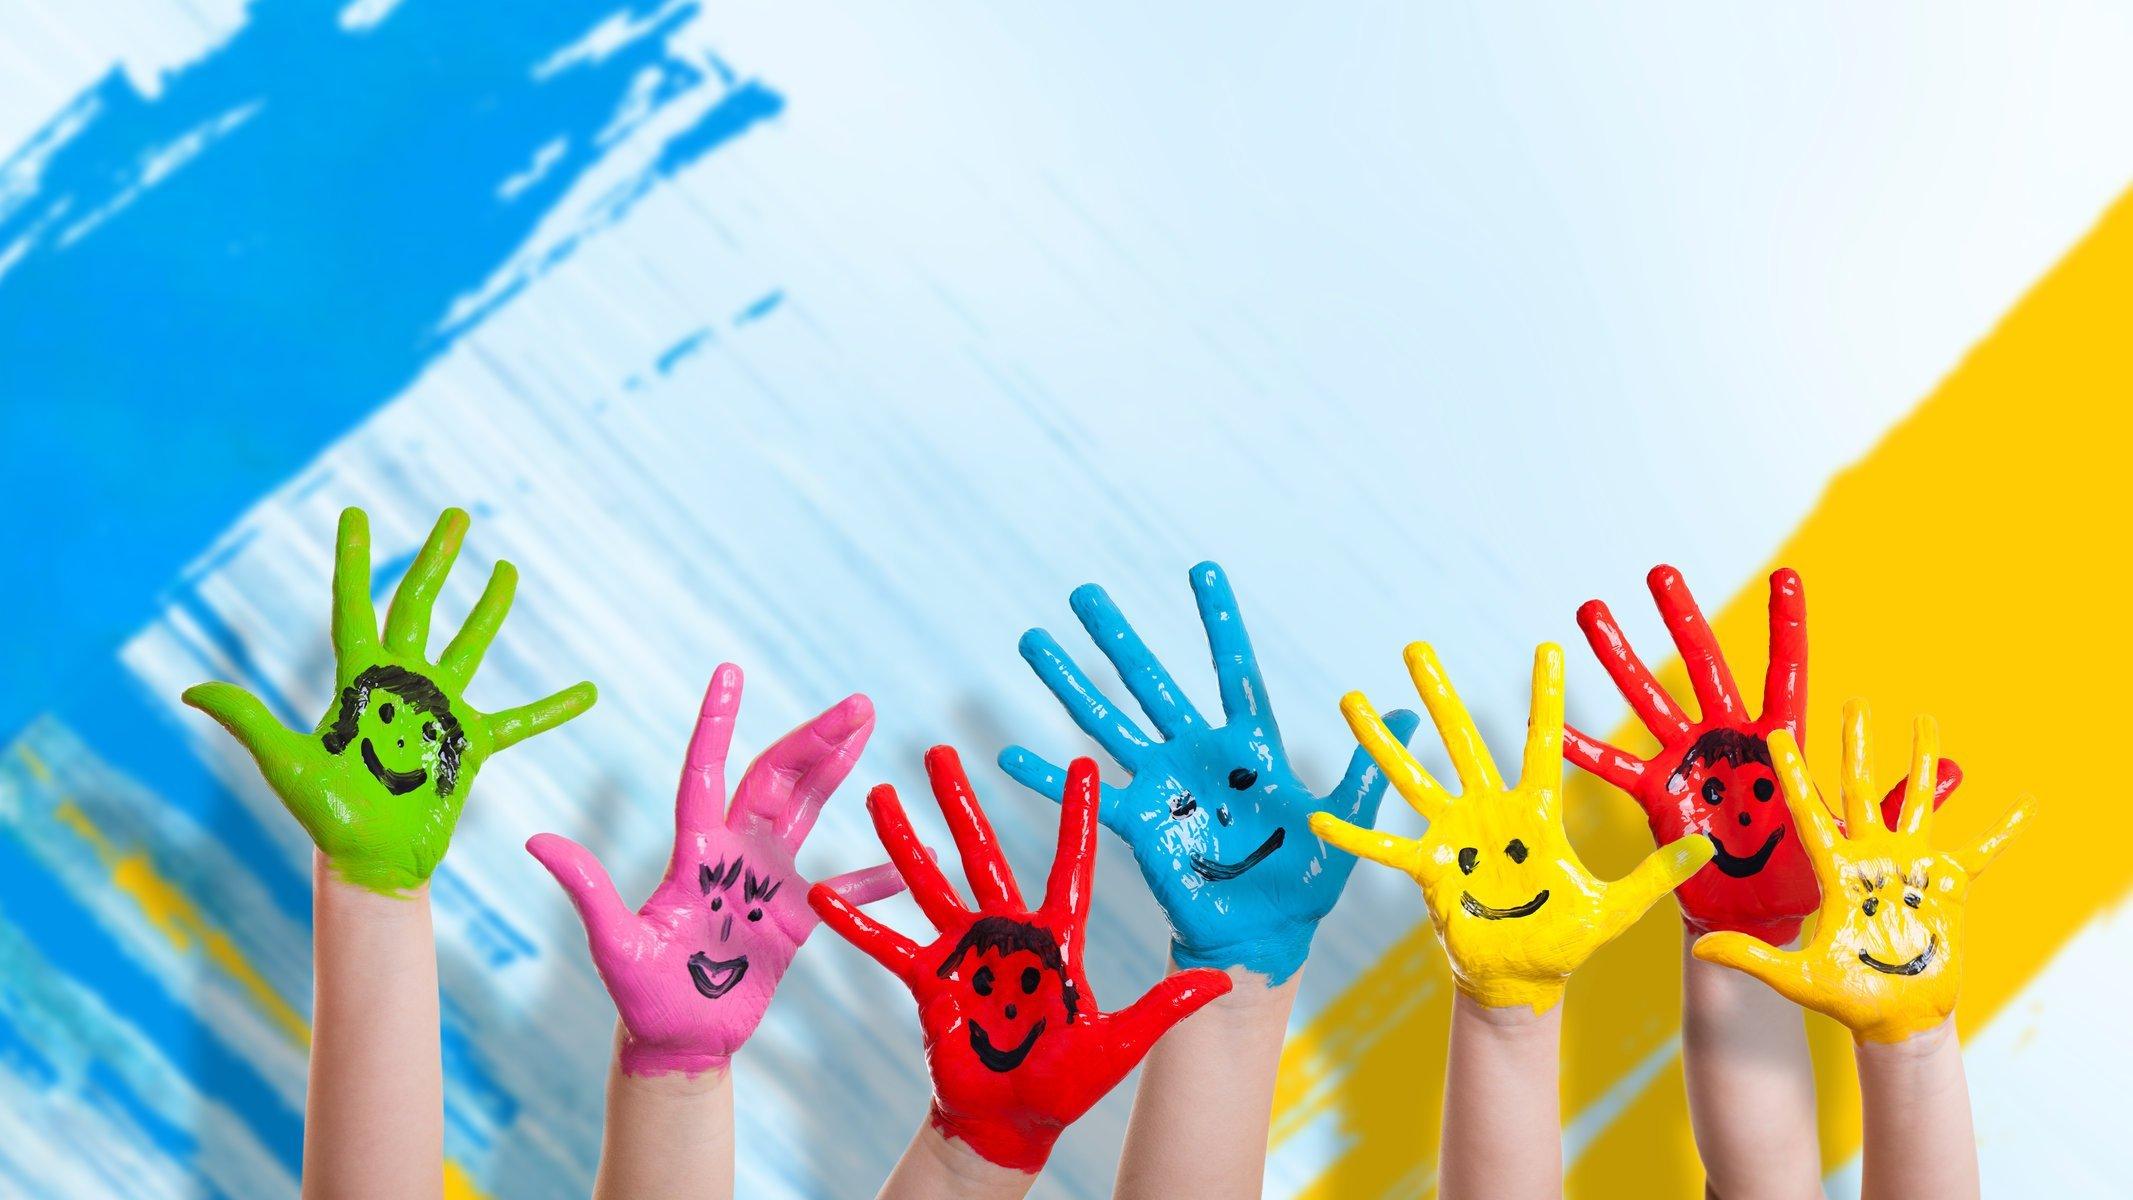 kids-children-hands-colour-wall-smiles-mode-drawing-happiness-children-children-hands-wall-color-smiles-mode-drawing-happiness